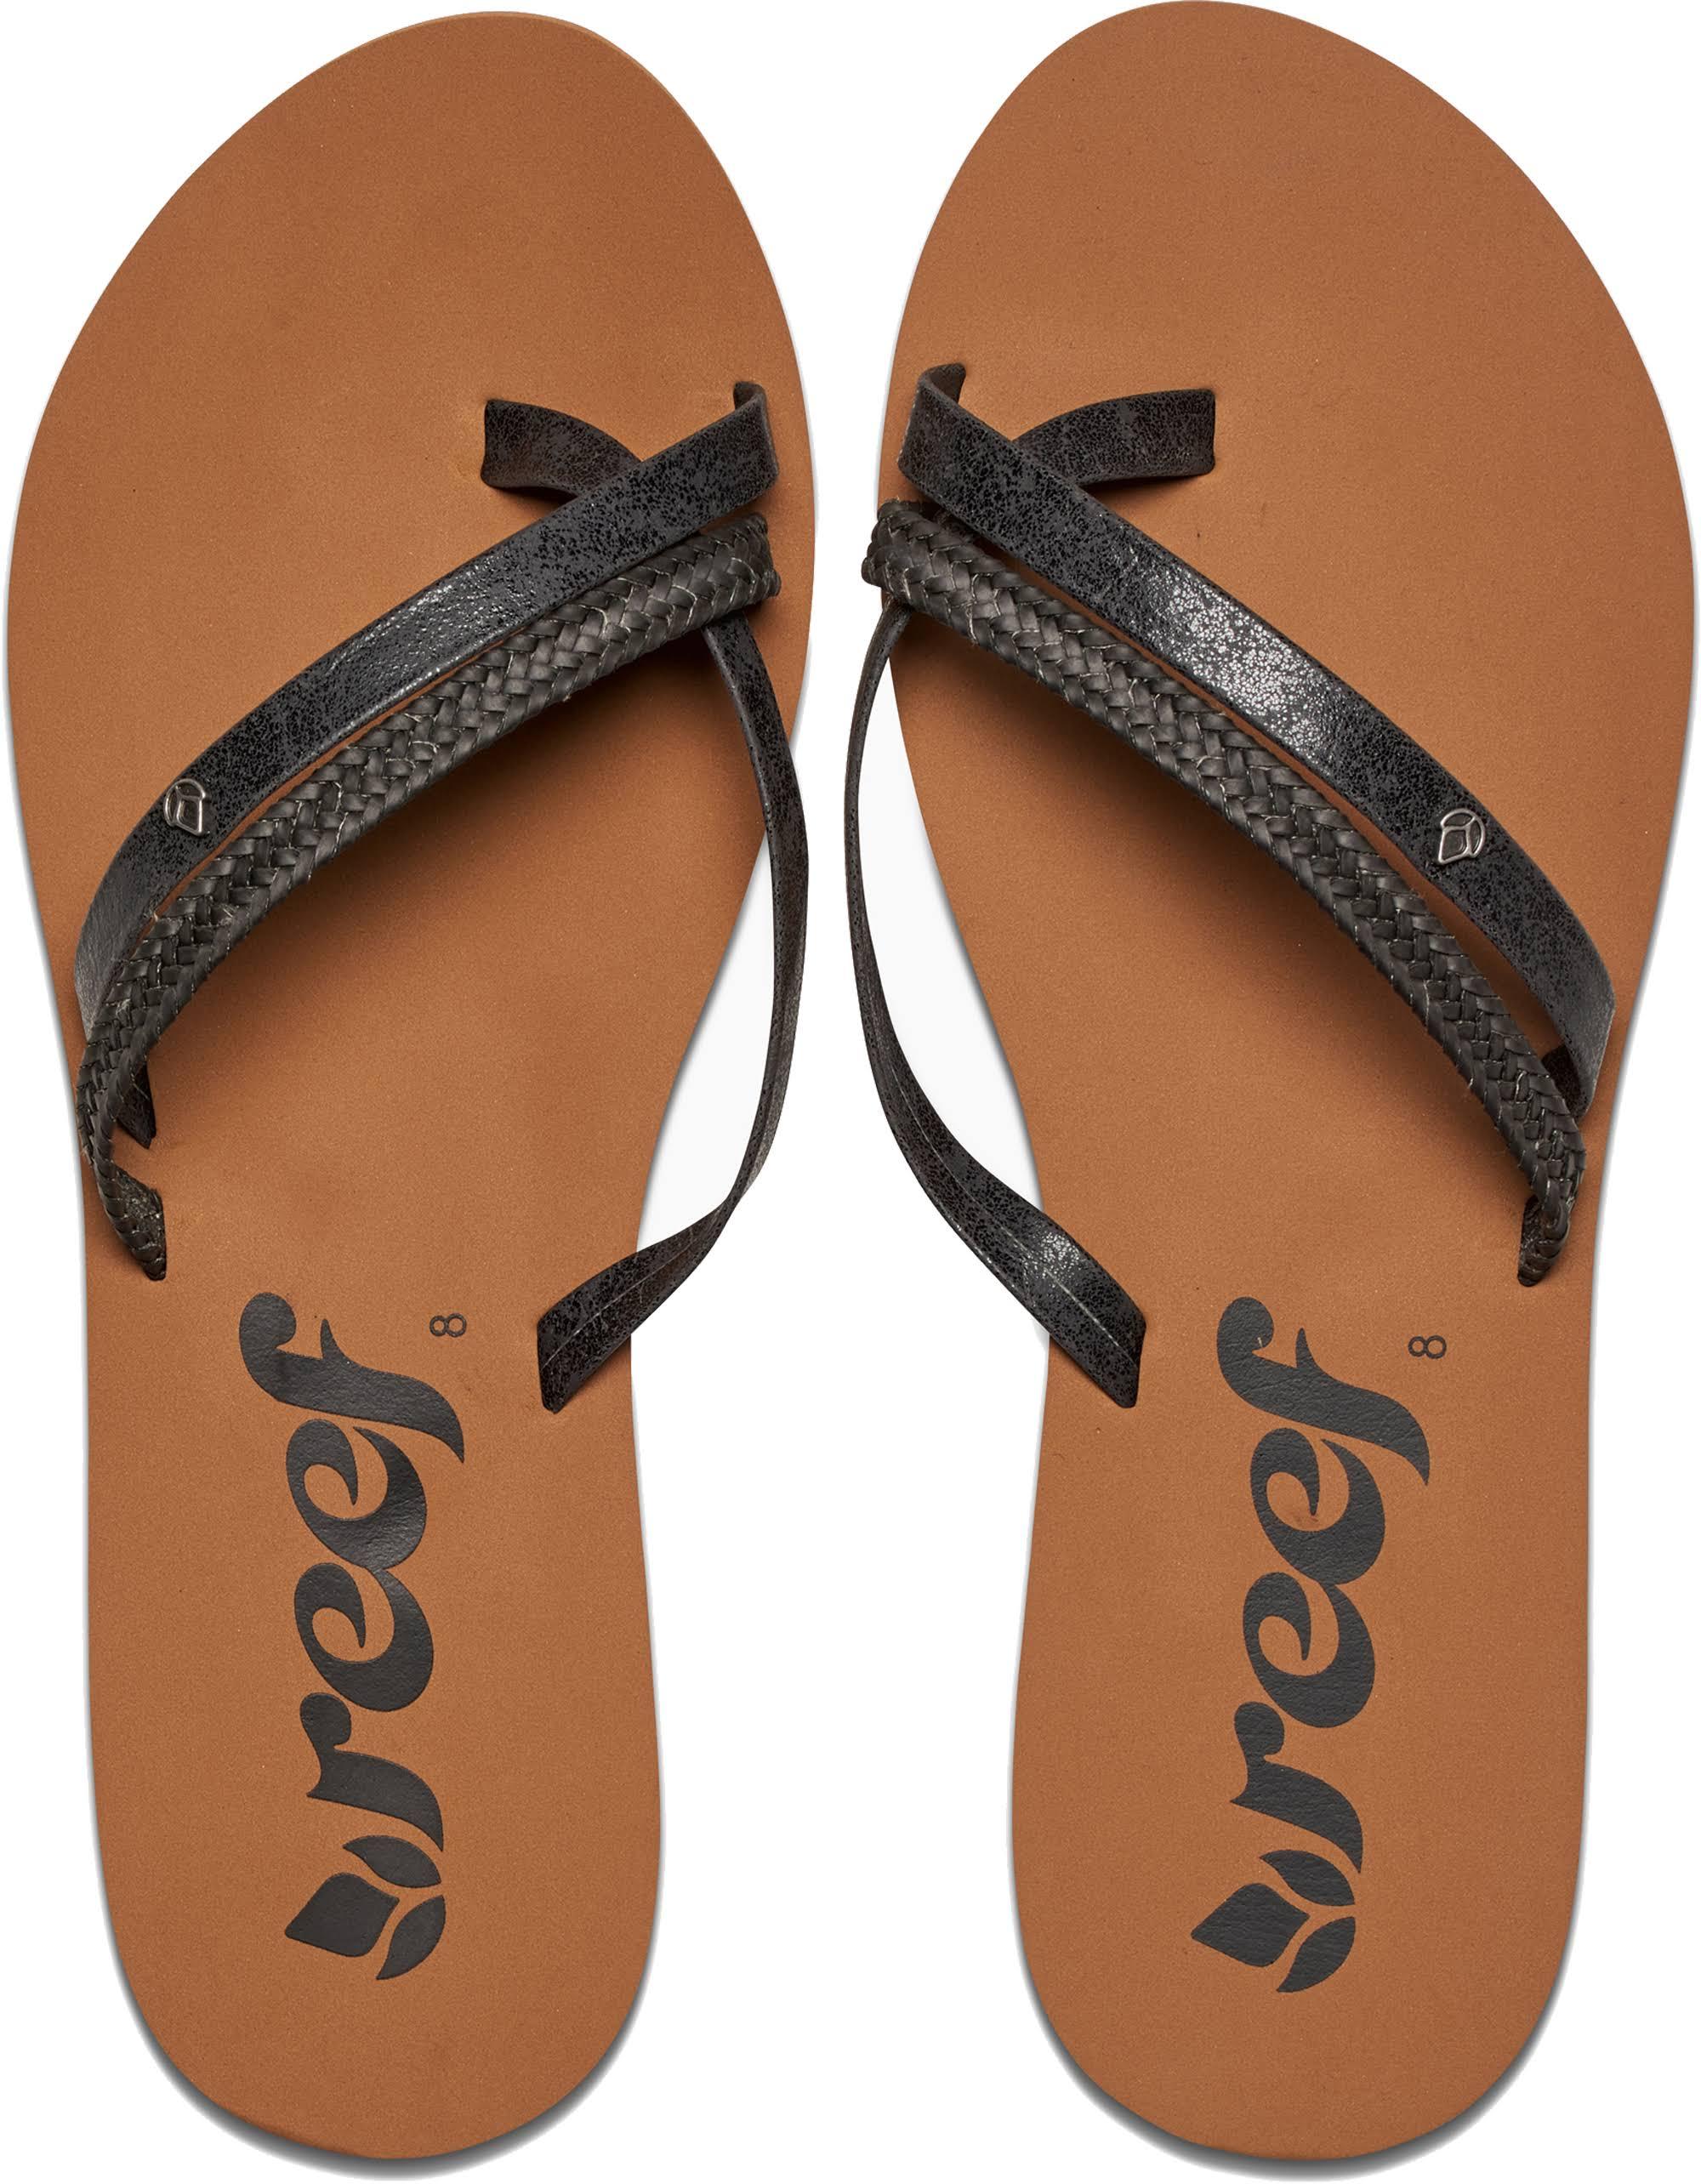 Reef 6 Sandals Black 0 black O'contrare Women Lx Size Women q0WOqvZr